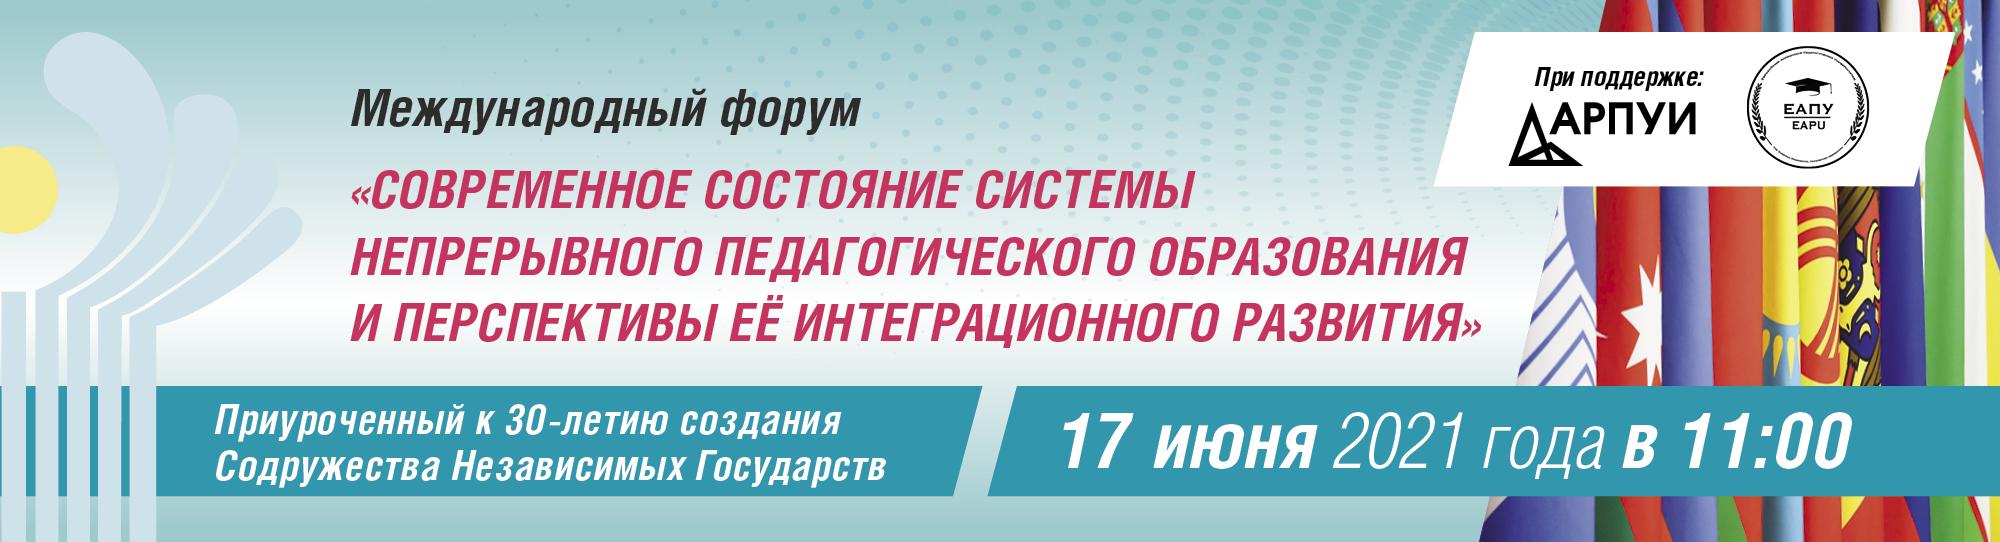 СССНПОПИР_30 лет_1